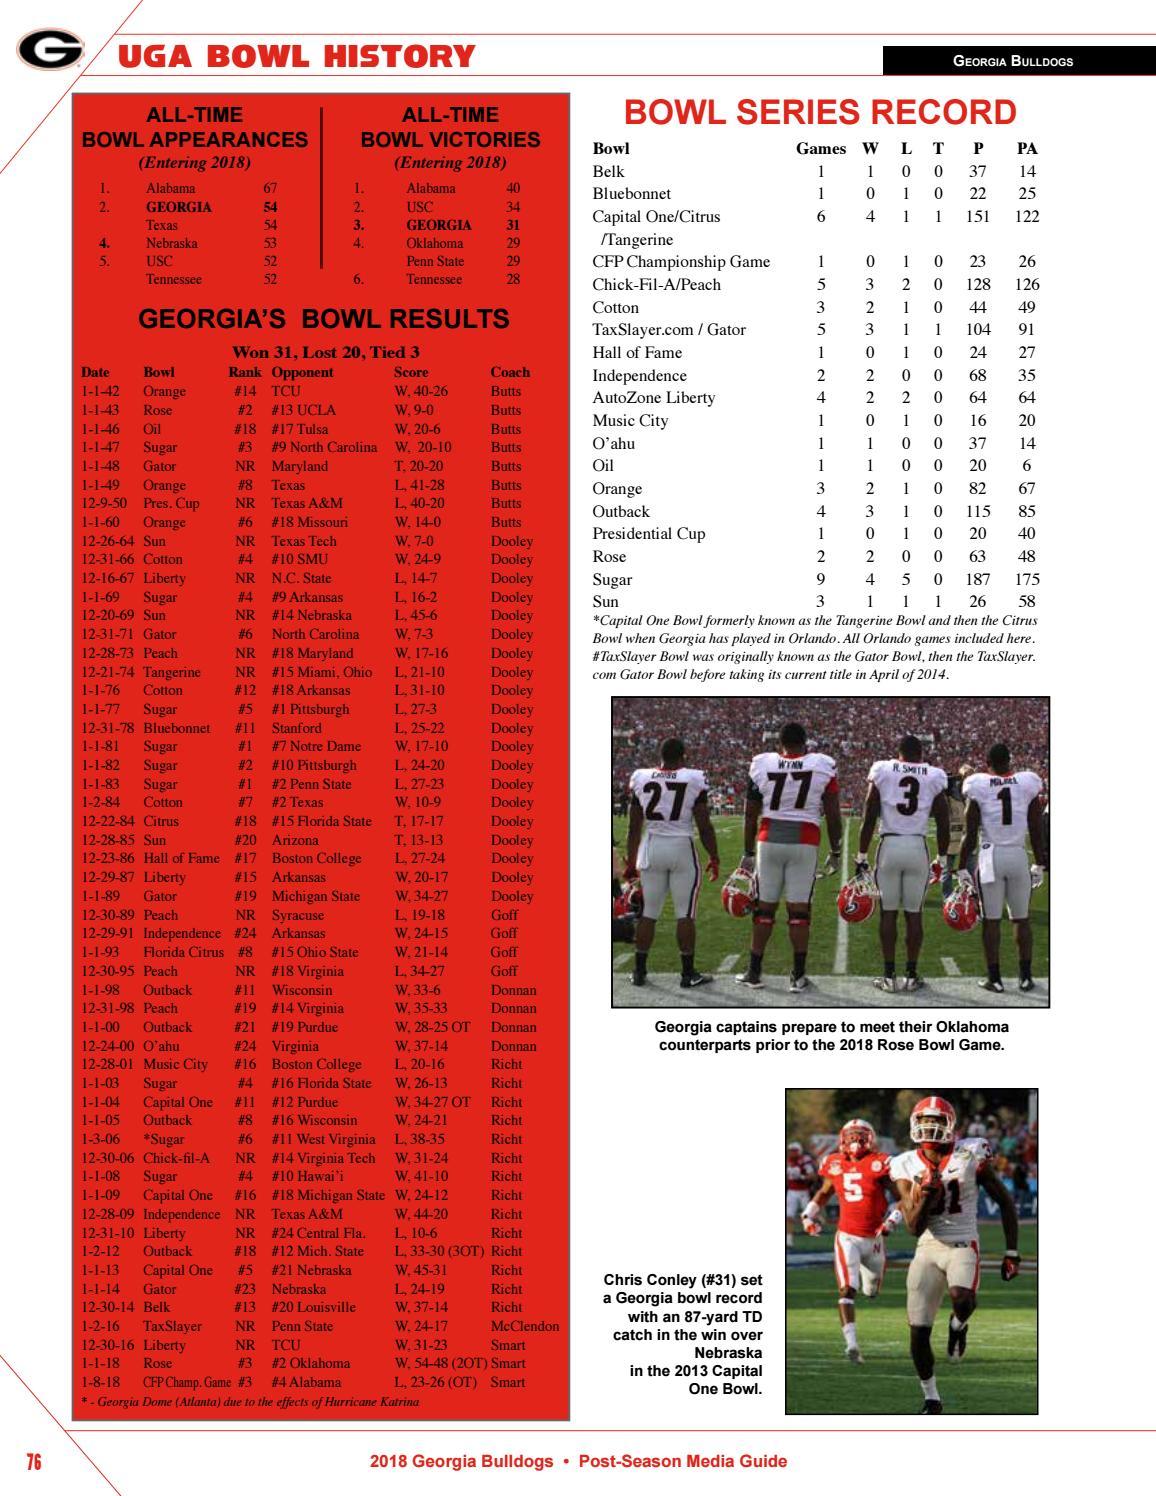 2018 Georgia Football Sugar Bowl Media Guide by Georgia Bulldogs